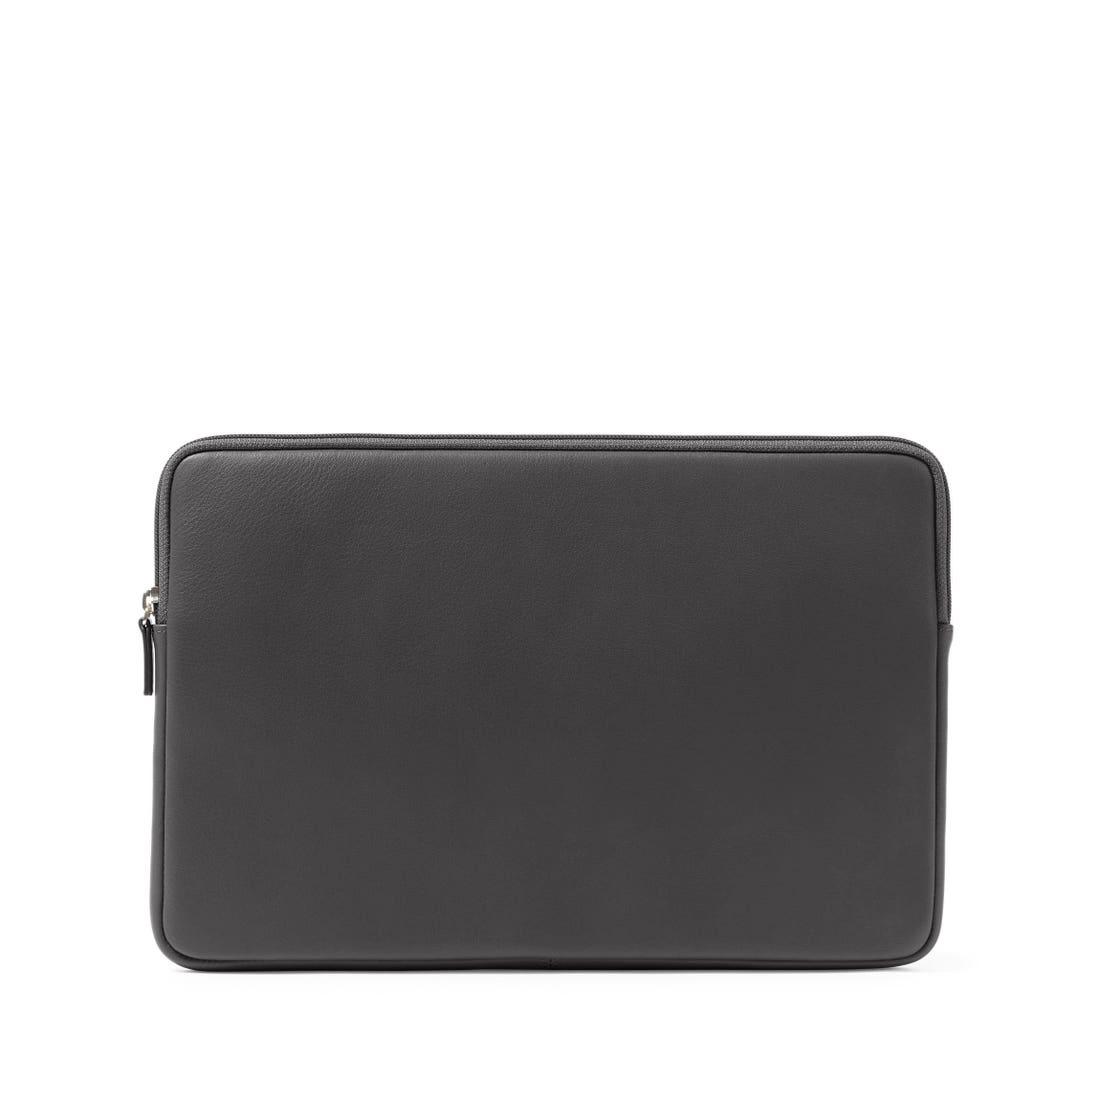 13 Inch MacBook Air Retina Sleeve